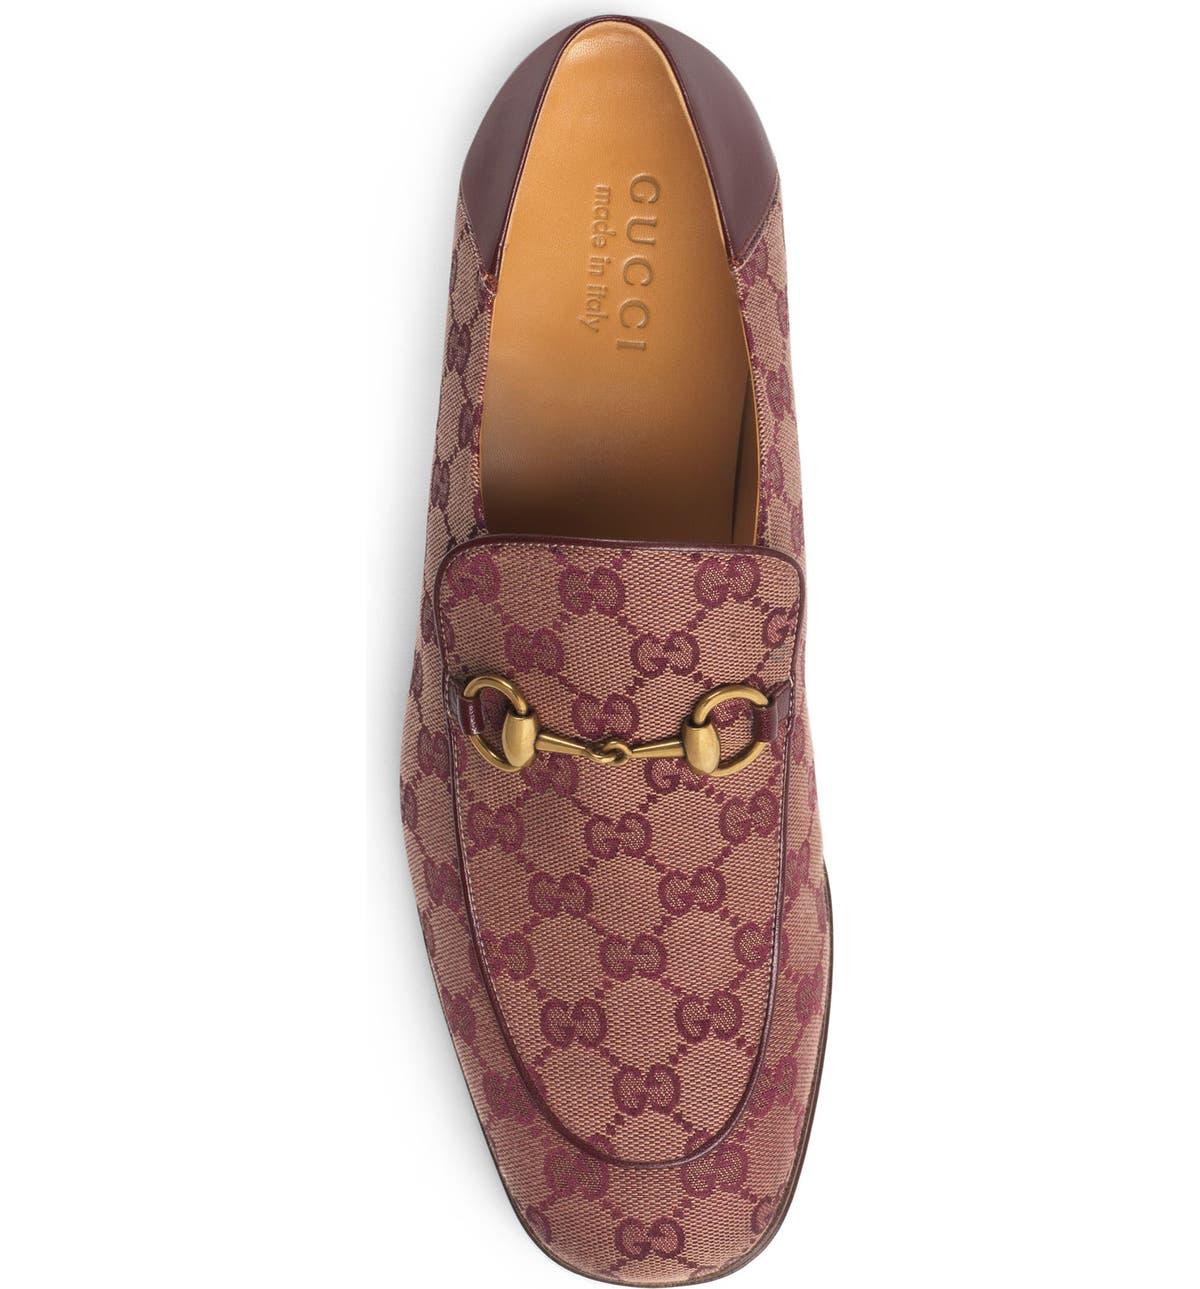 ebf4b1ffd51 Gucci Mister Bit Loafer (Men)